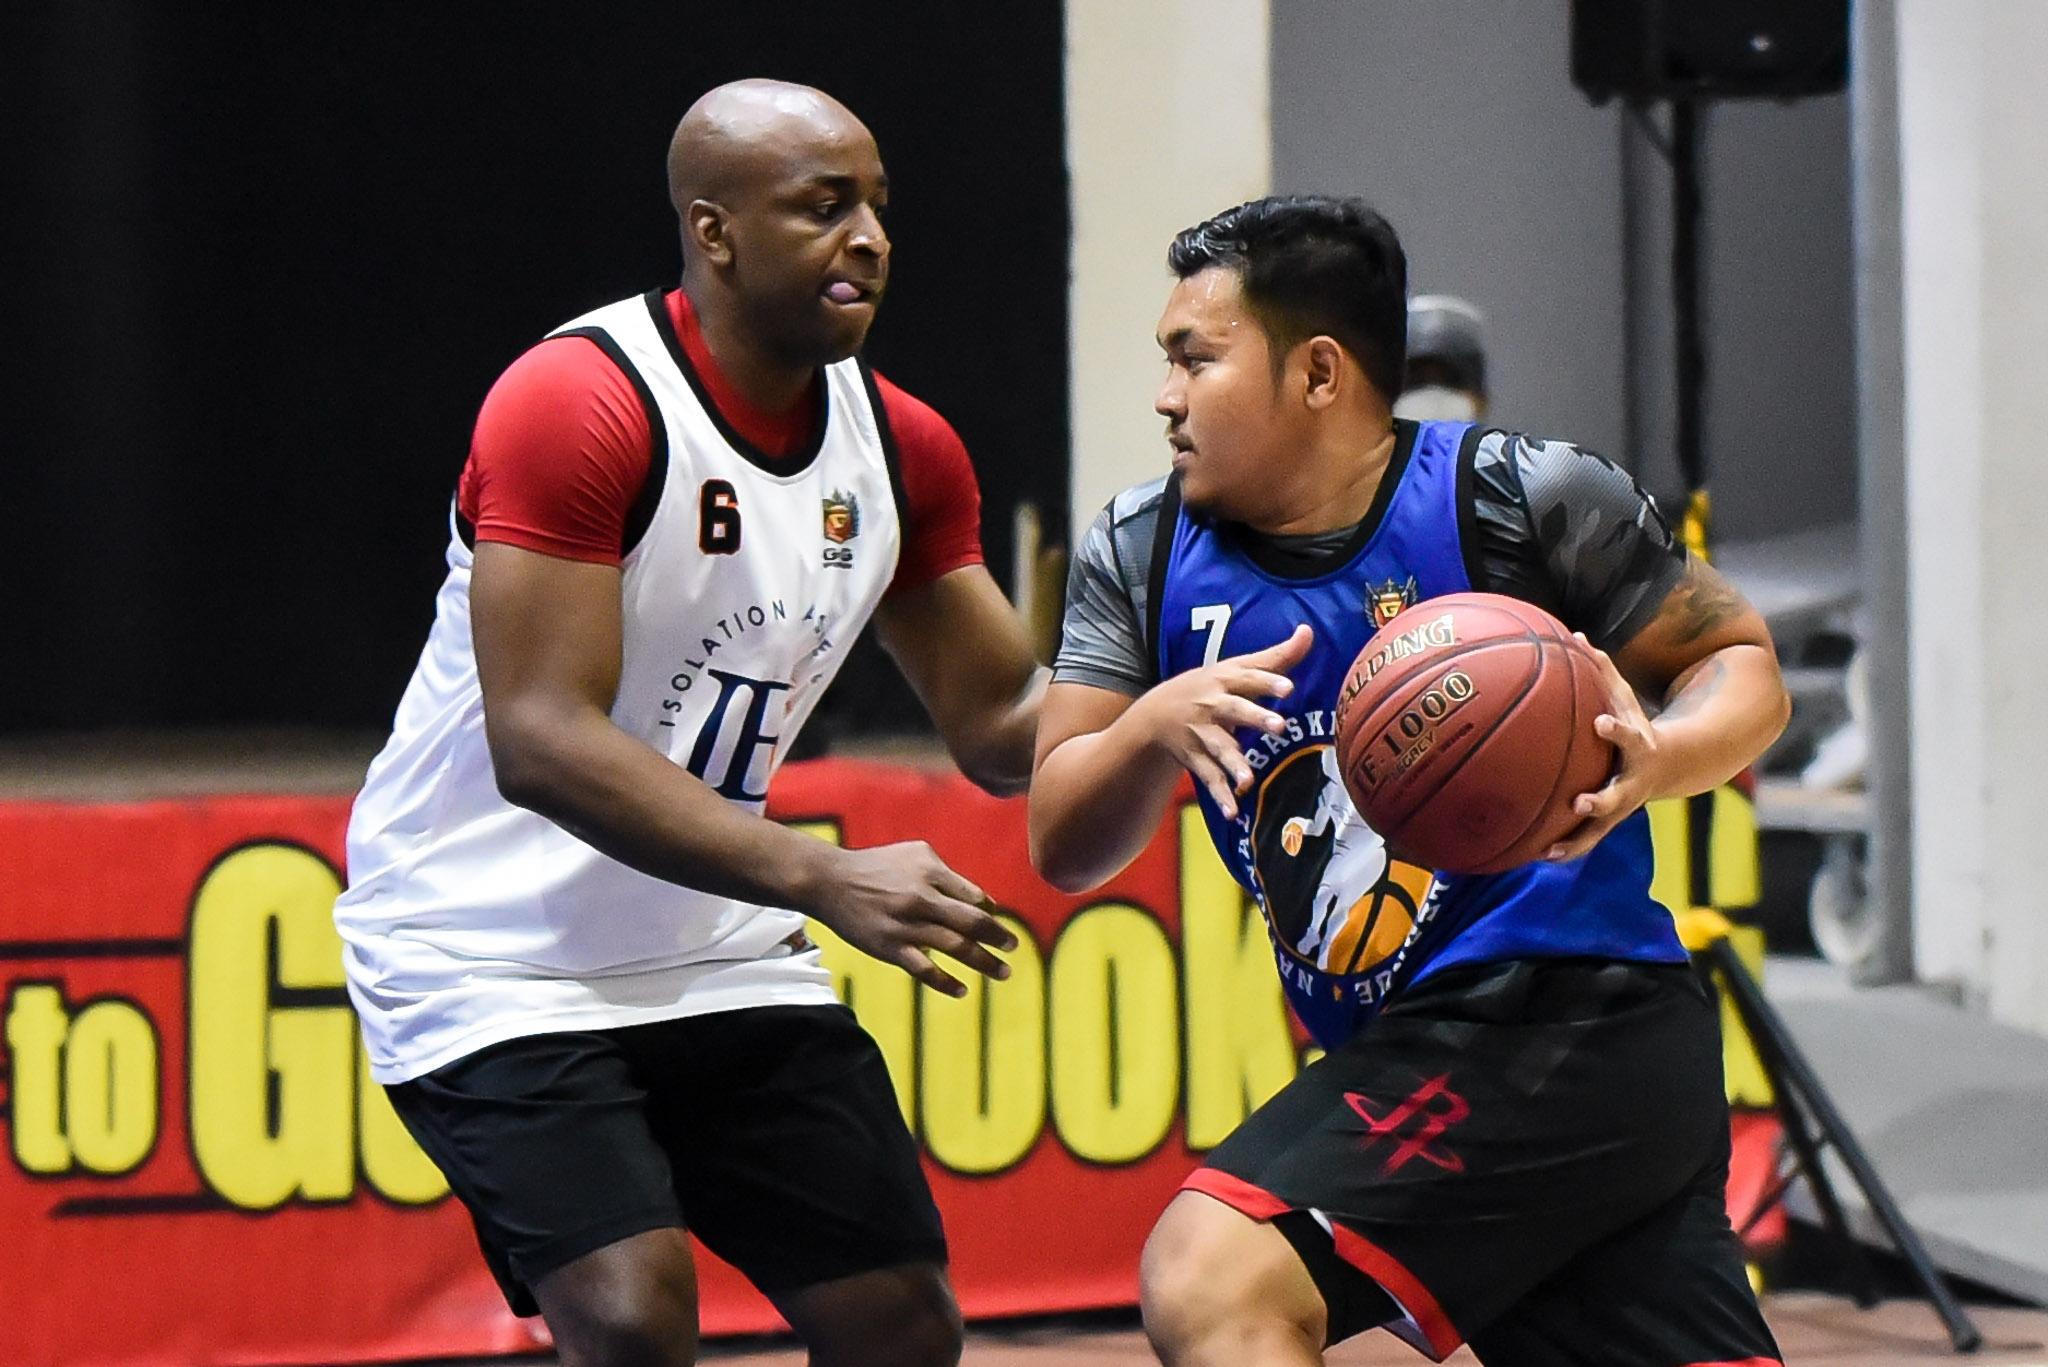 NBL-IBC-1v1-Games_Men-Heavyweight_Teodoro Lim outlasts Penaranda as Paranaque Lady Aces dominate NBL-WNBL 1v1 1-on-1 NBL News  - philippine sports news